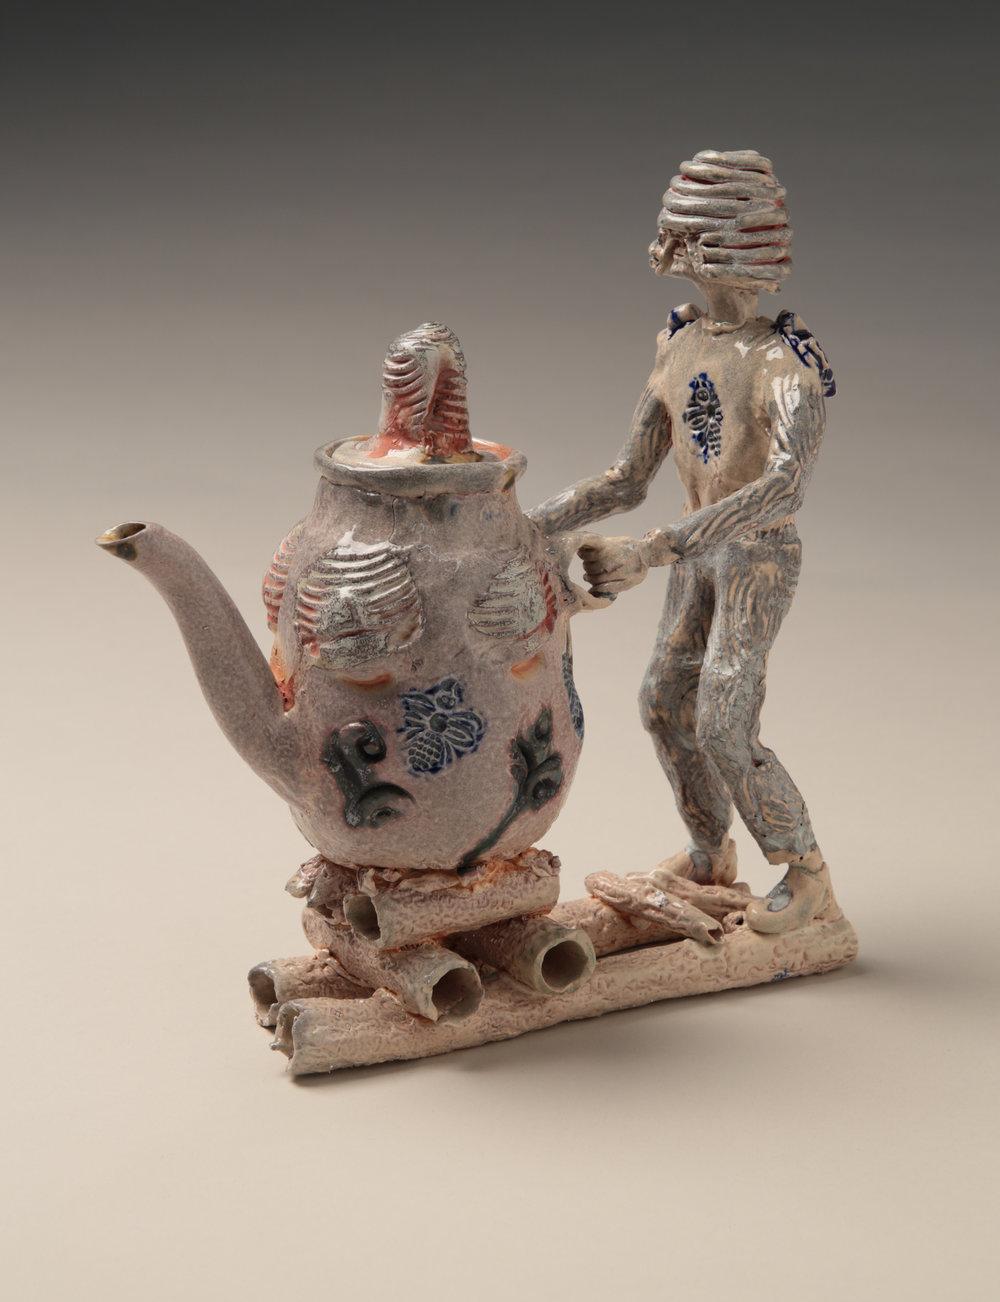 Beekeeper Teapot, 2013